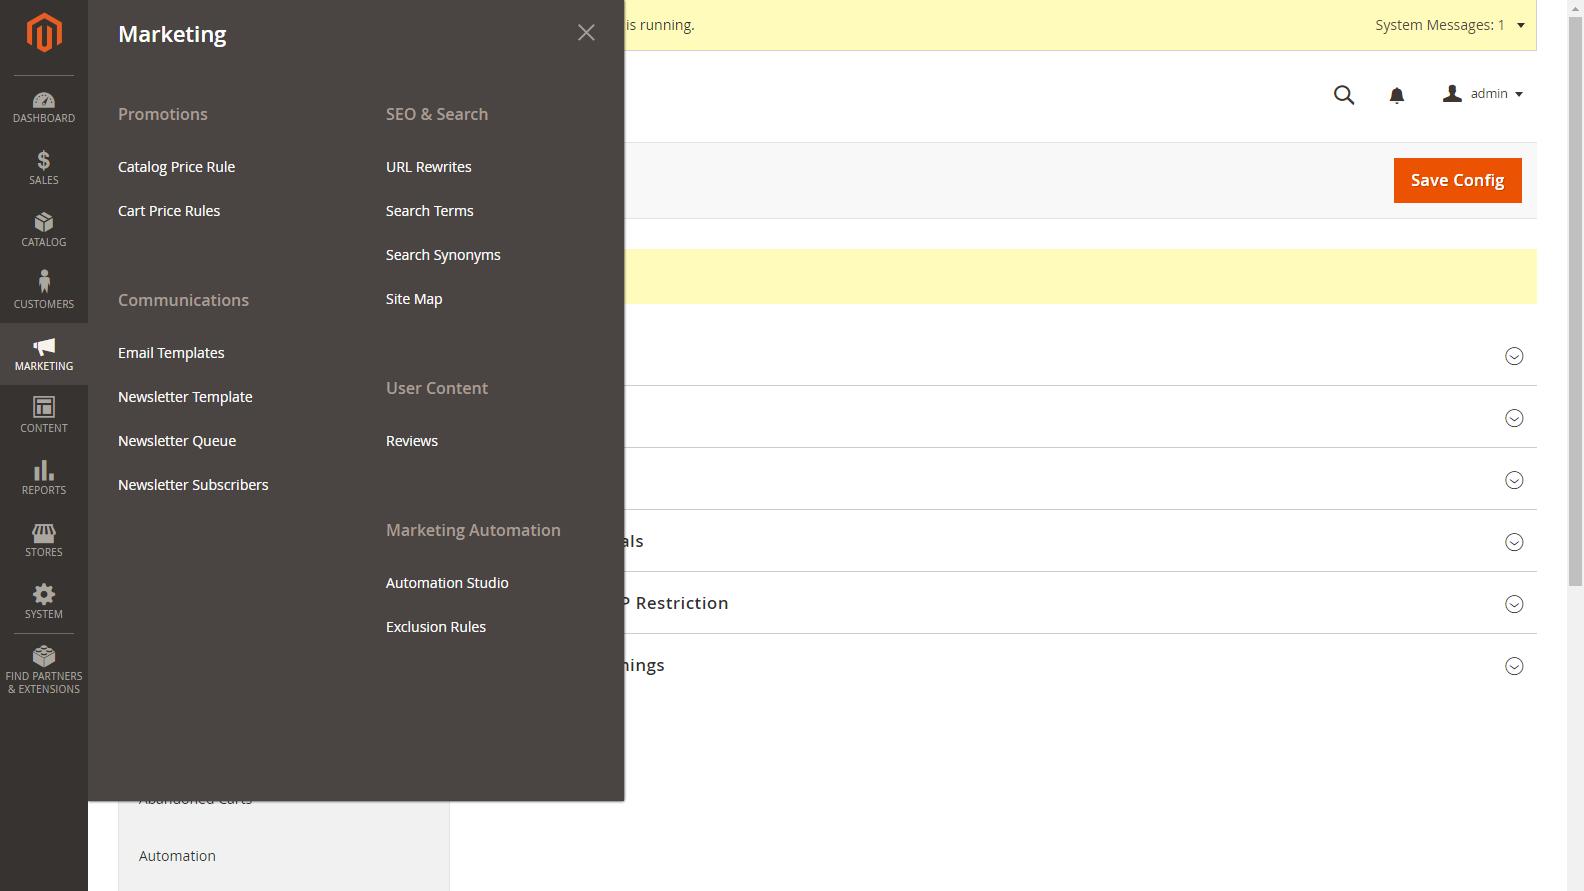 Magento 2 Admin panel - Marketing menu